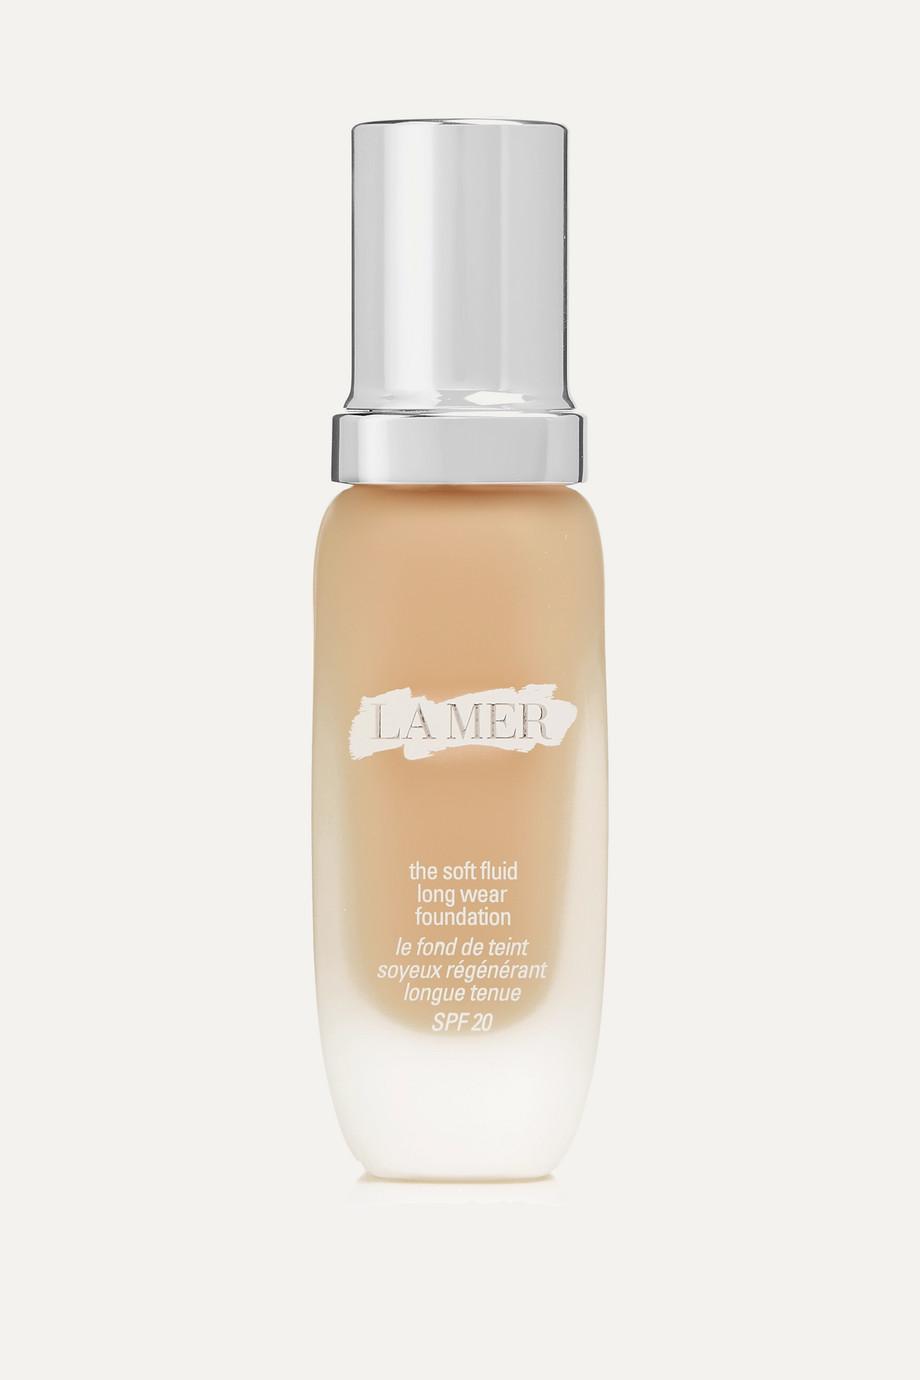 La Mer The Soft Fluid Long Wear Foundation SPF20 - 350 Honey, 30ml